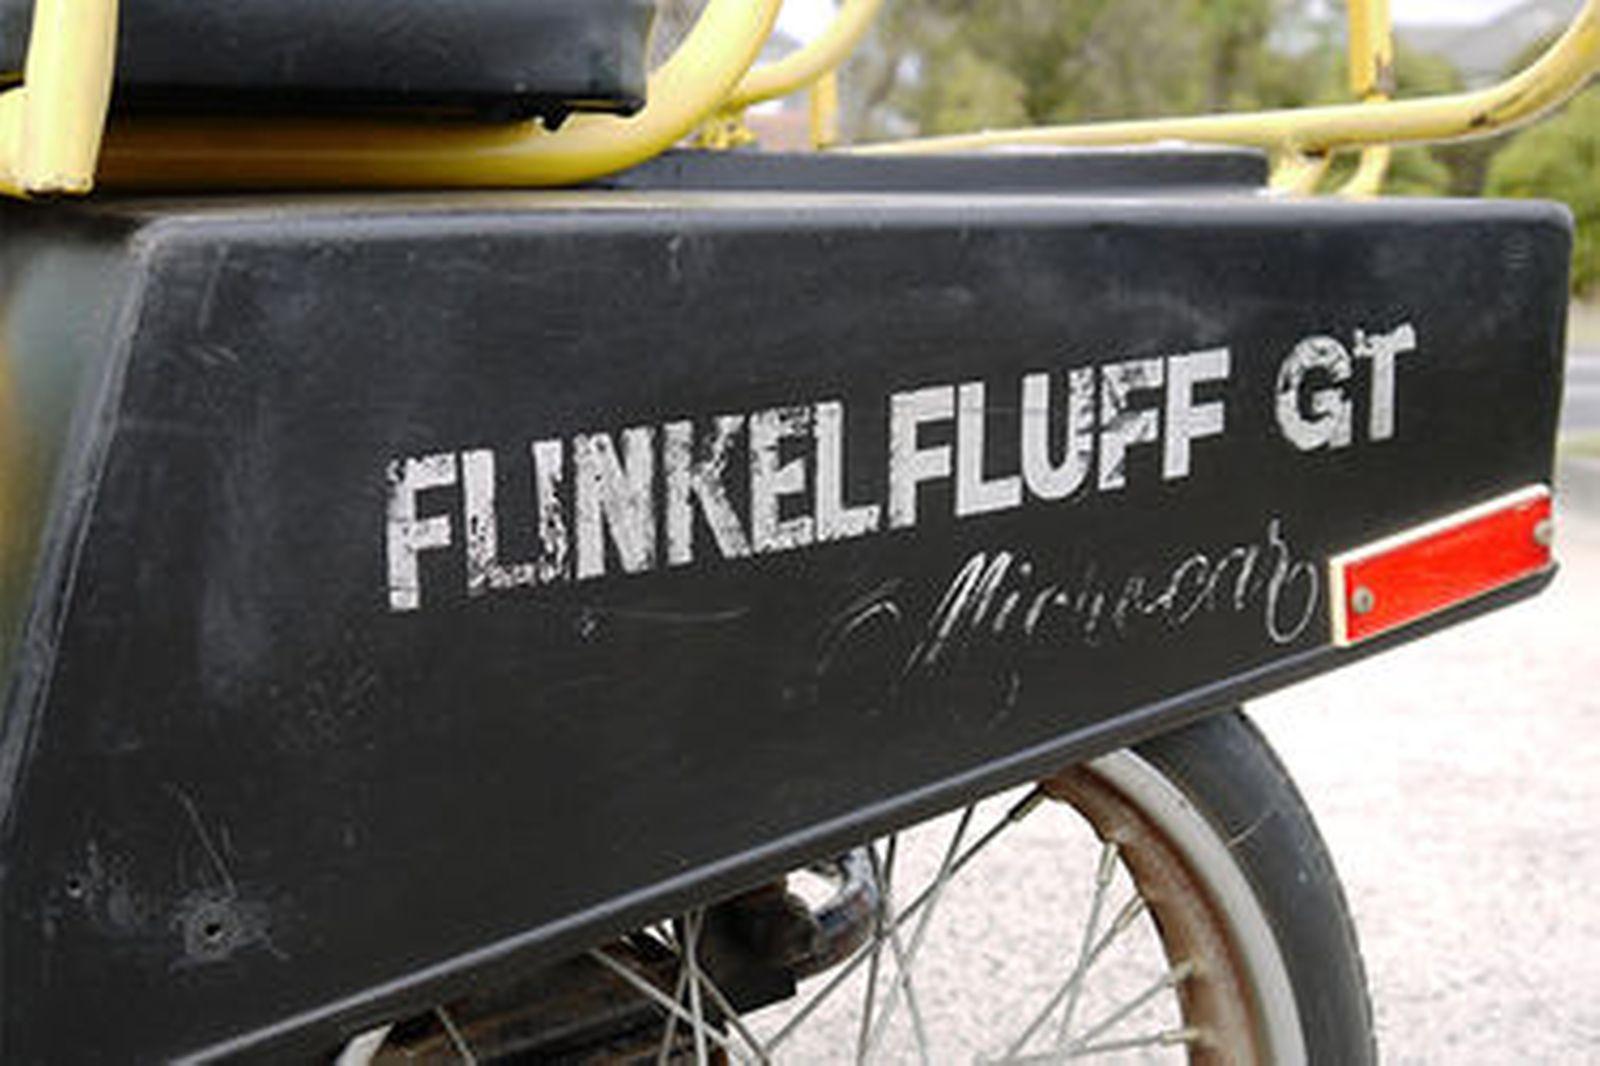 3 Wheeler Flinkelfluff GT with 2 stroke Tomos engine on removable tubular frame